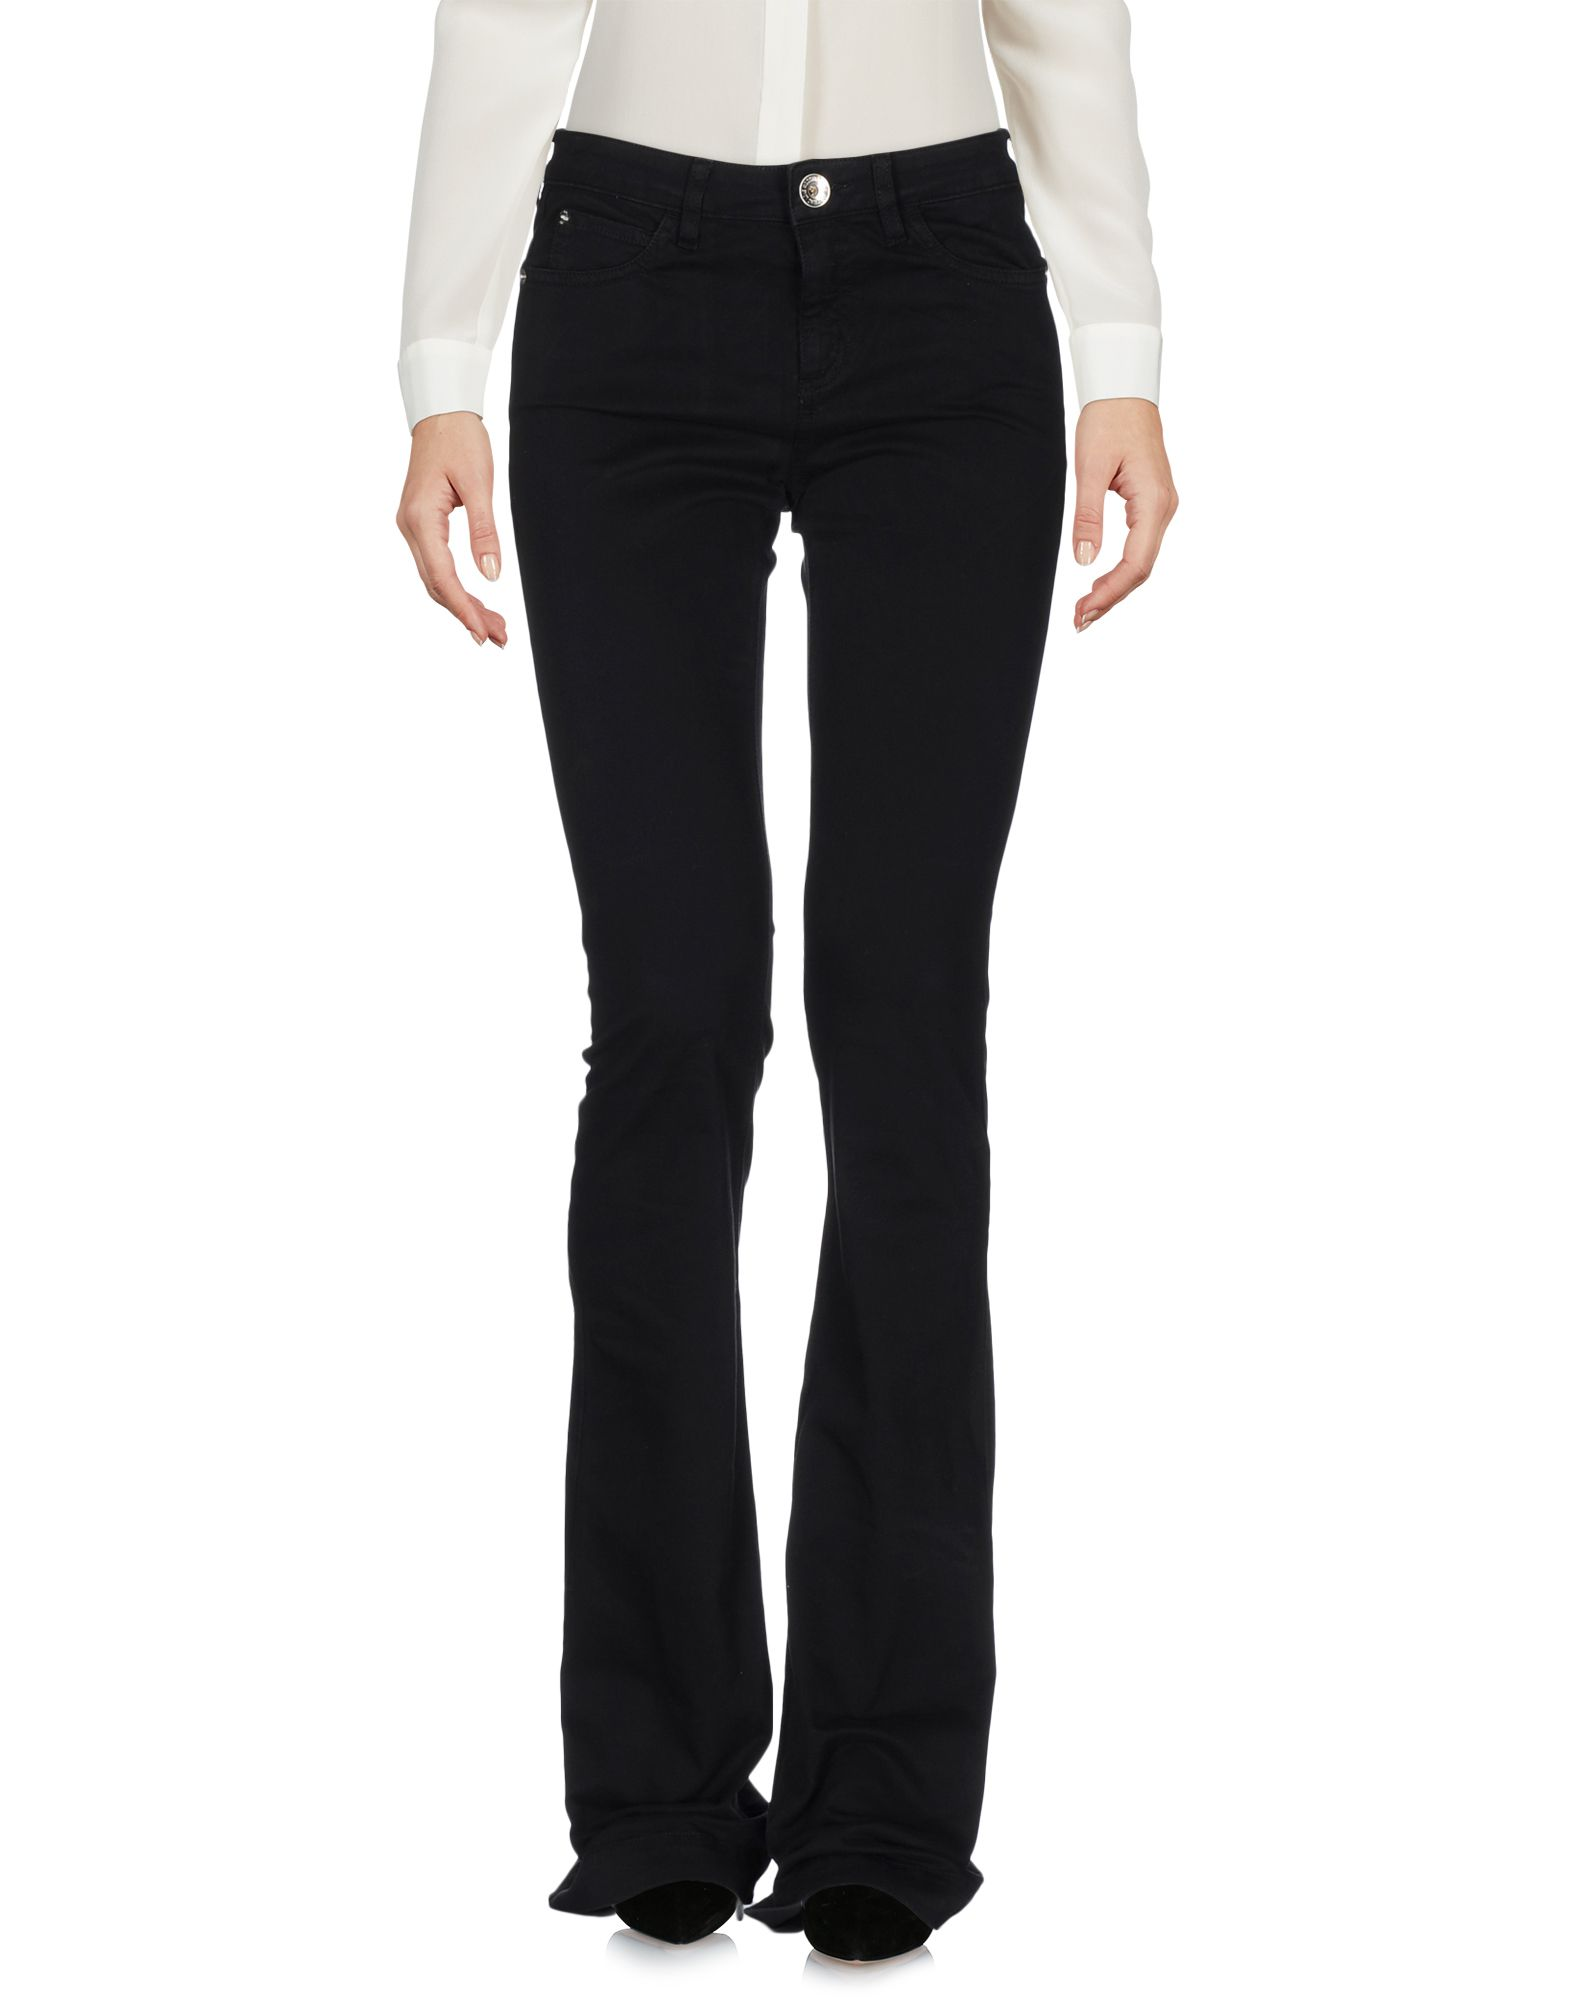 Pantalone   Mos no donna donna donna - 13003507FF 055